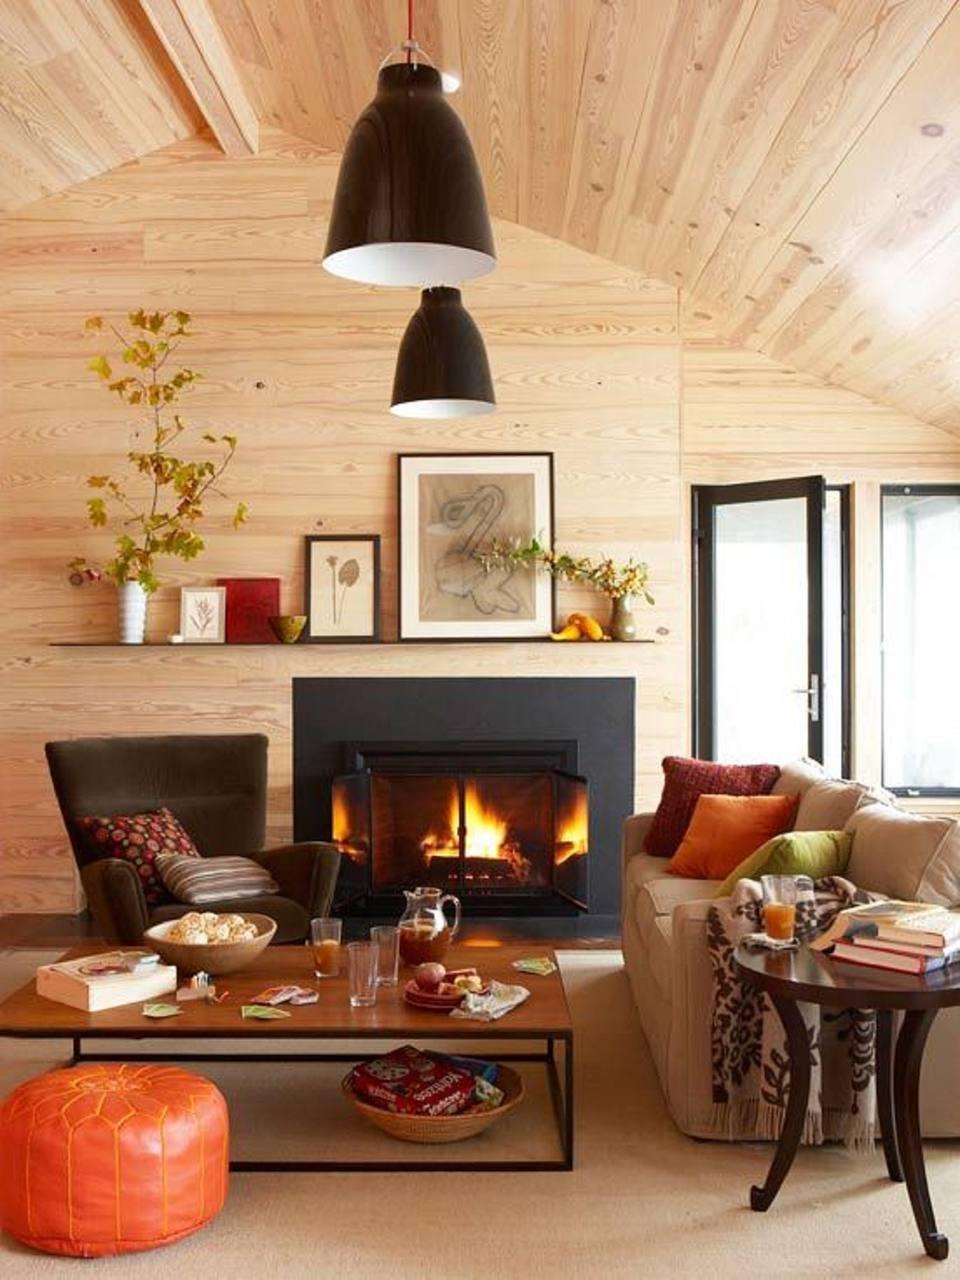 Autumn Living Room Decorating: 24 Creative Fall Harvest Home Decor Ideas